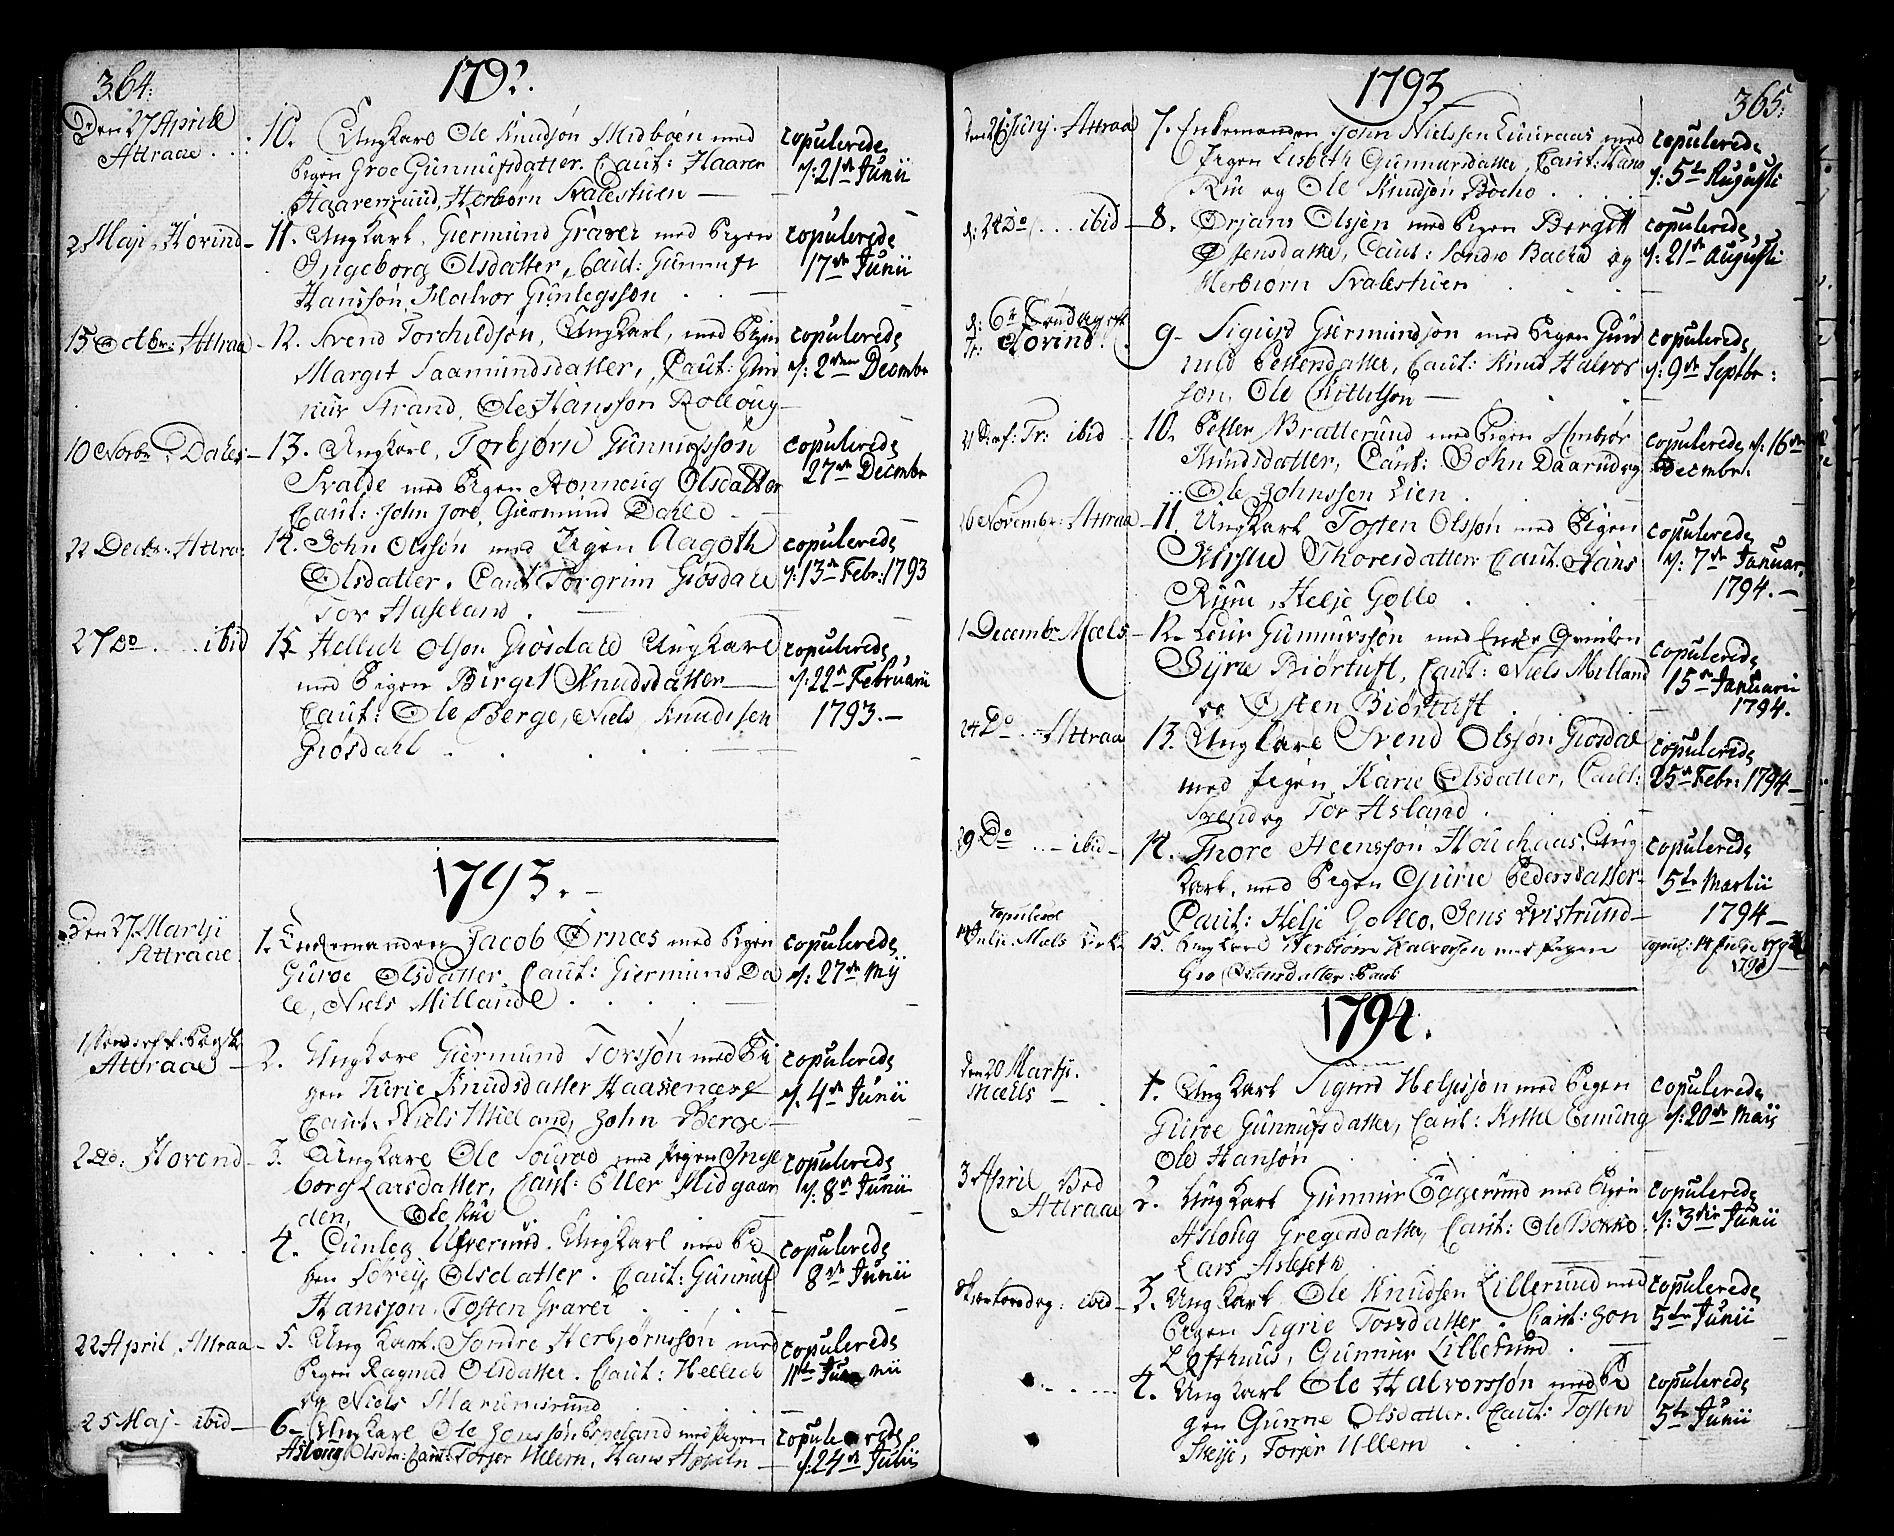 SAKO, Tinn kirkebøker, F/Fa/L0002: Ministerialbok nr. I 2, 1757-1810, s. 364-365